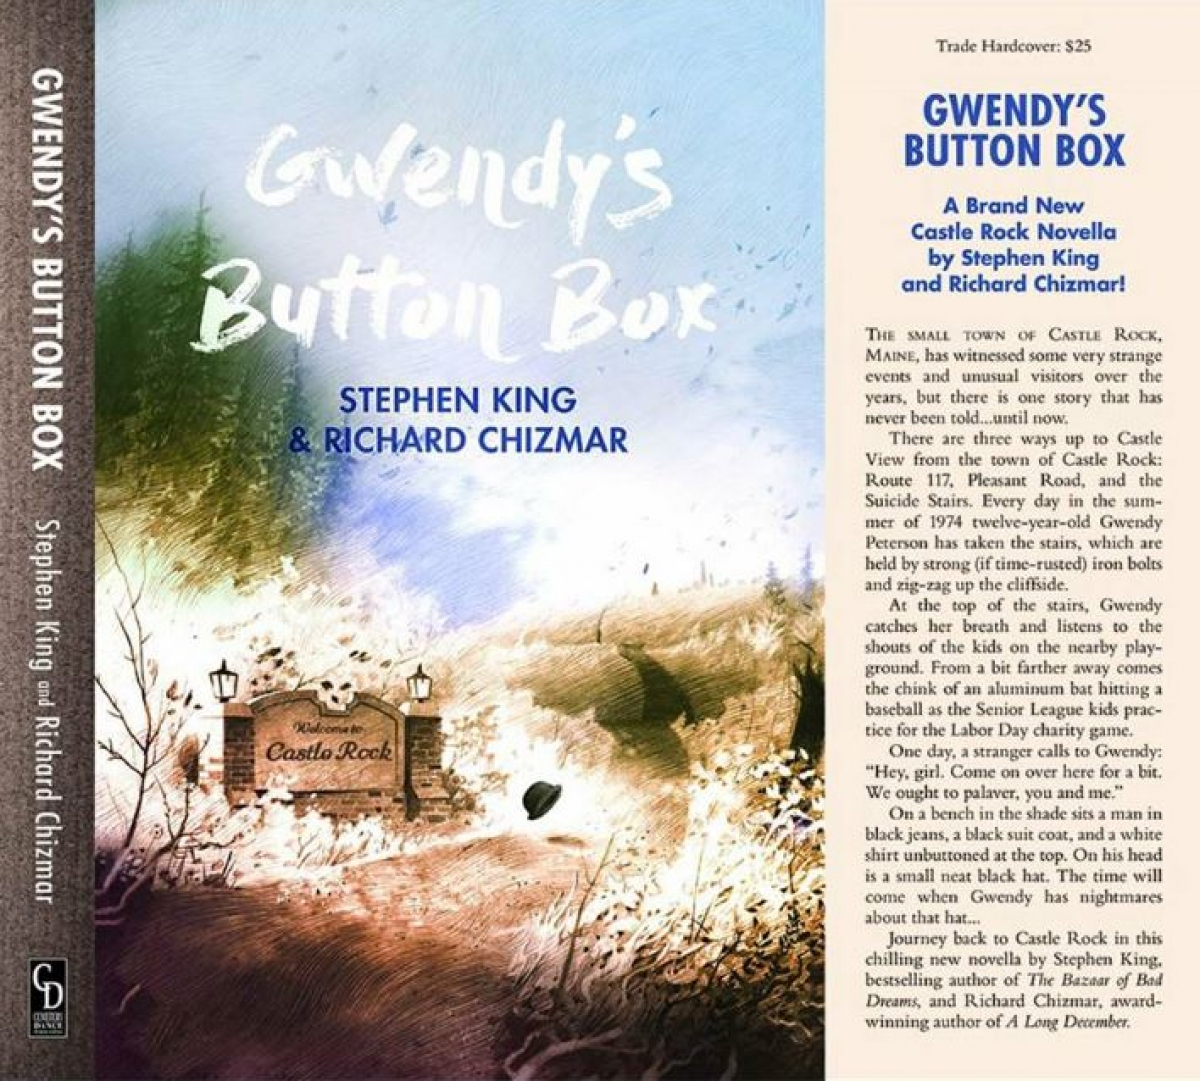 """Gwendy's Button Box"" - okładka Nocturnal Reader's Box - obrazek"